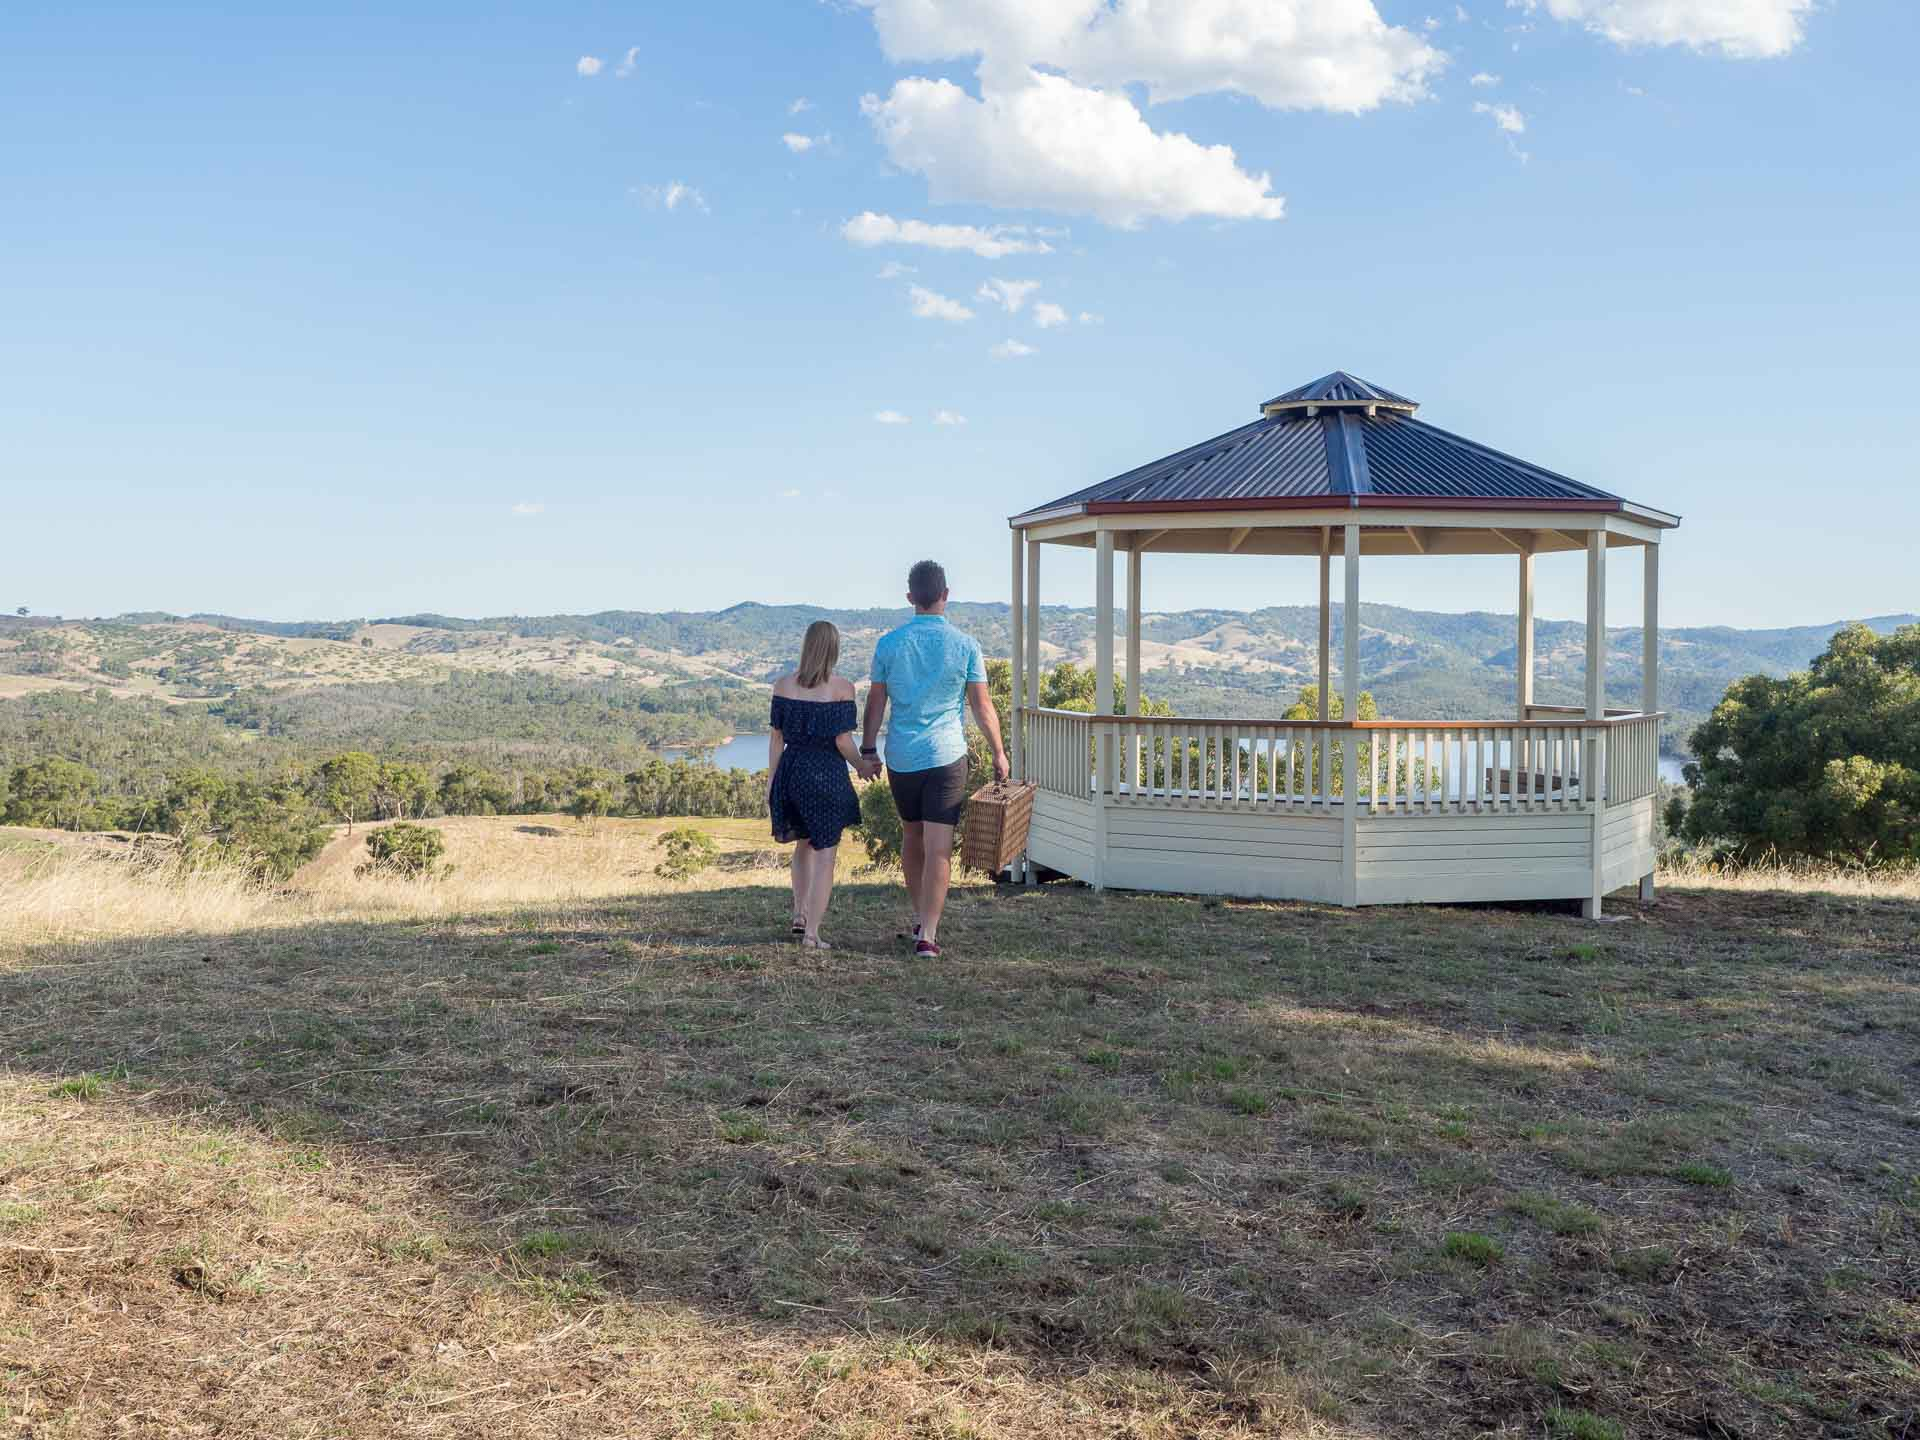 Pergola, Verandah & Patio - Looking pergola, verandah or patio installation? Get a free measure and quote.